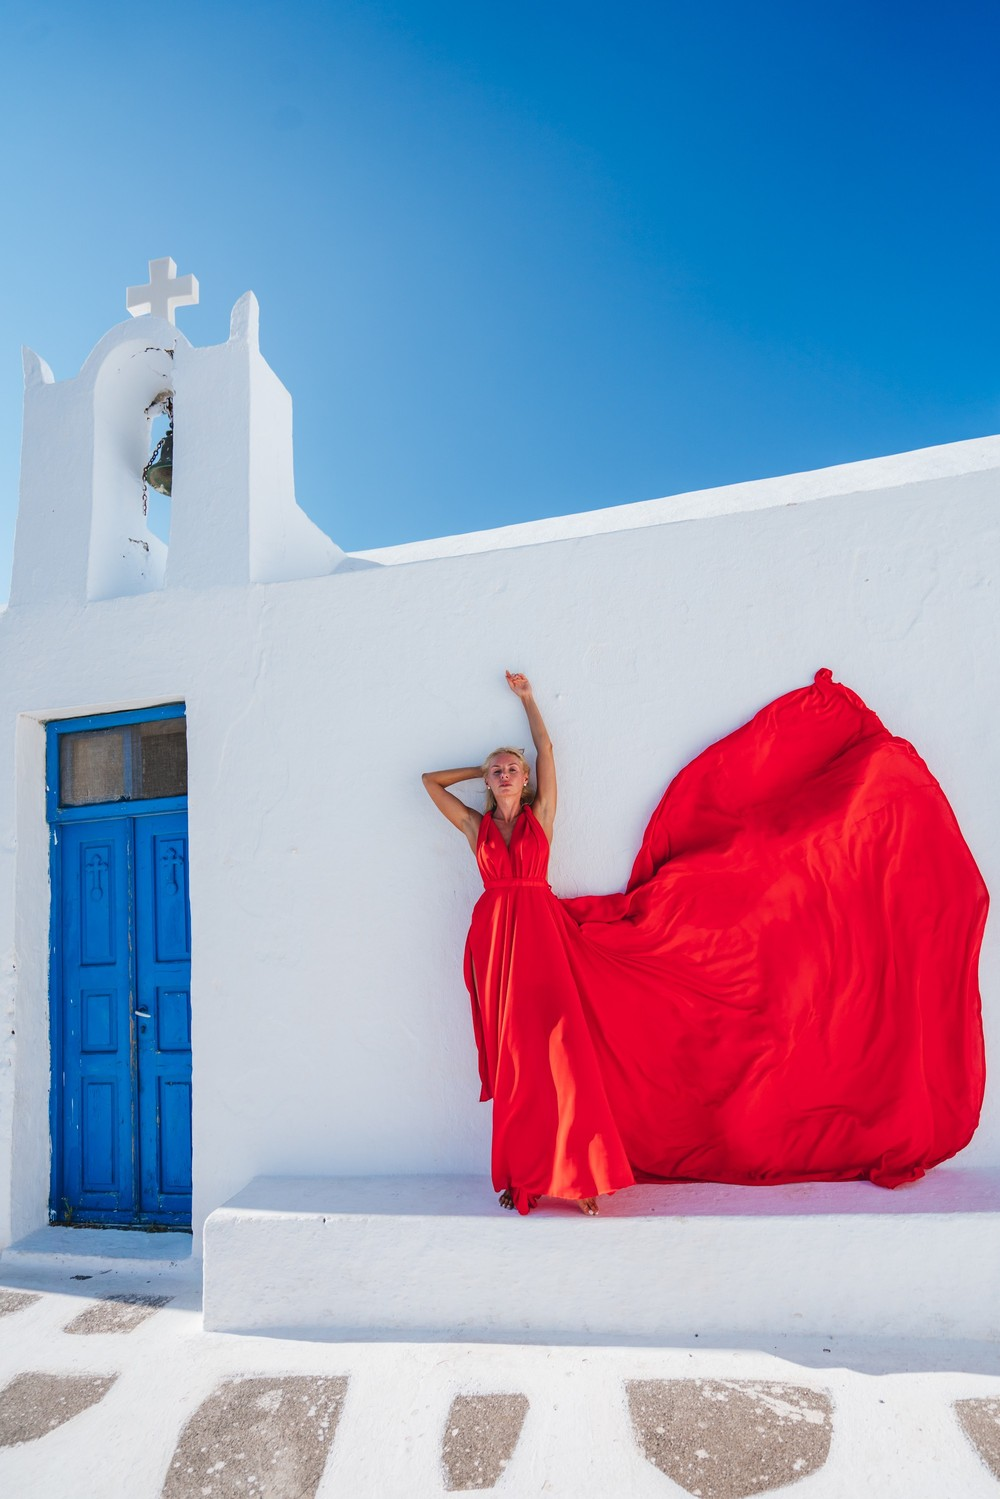 FLYING DRESSES CATALOGUE/ЛЕТЯЩИЕ ПЛАТЬЯ - RED TRANSFORMER DRESS